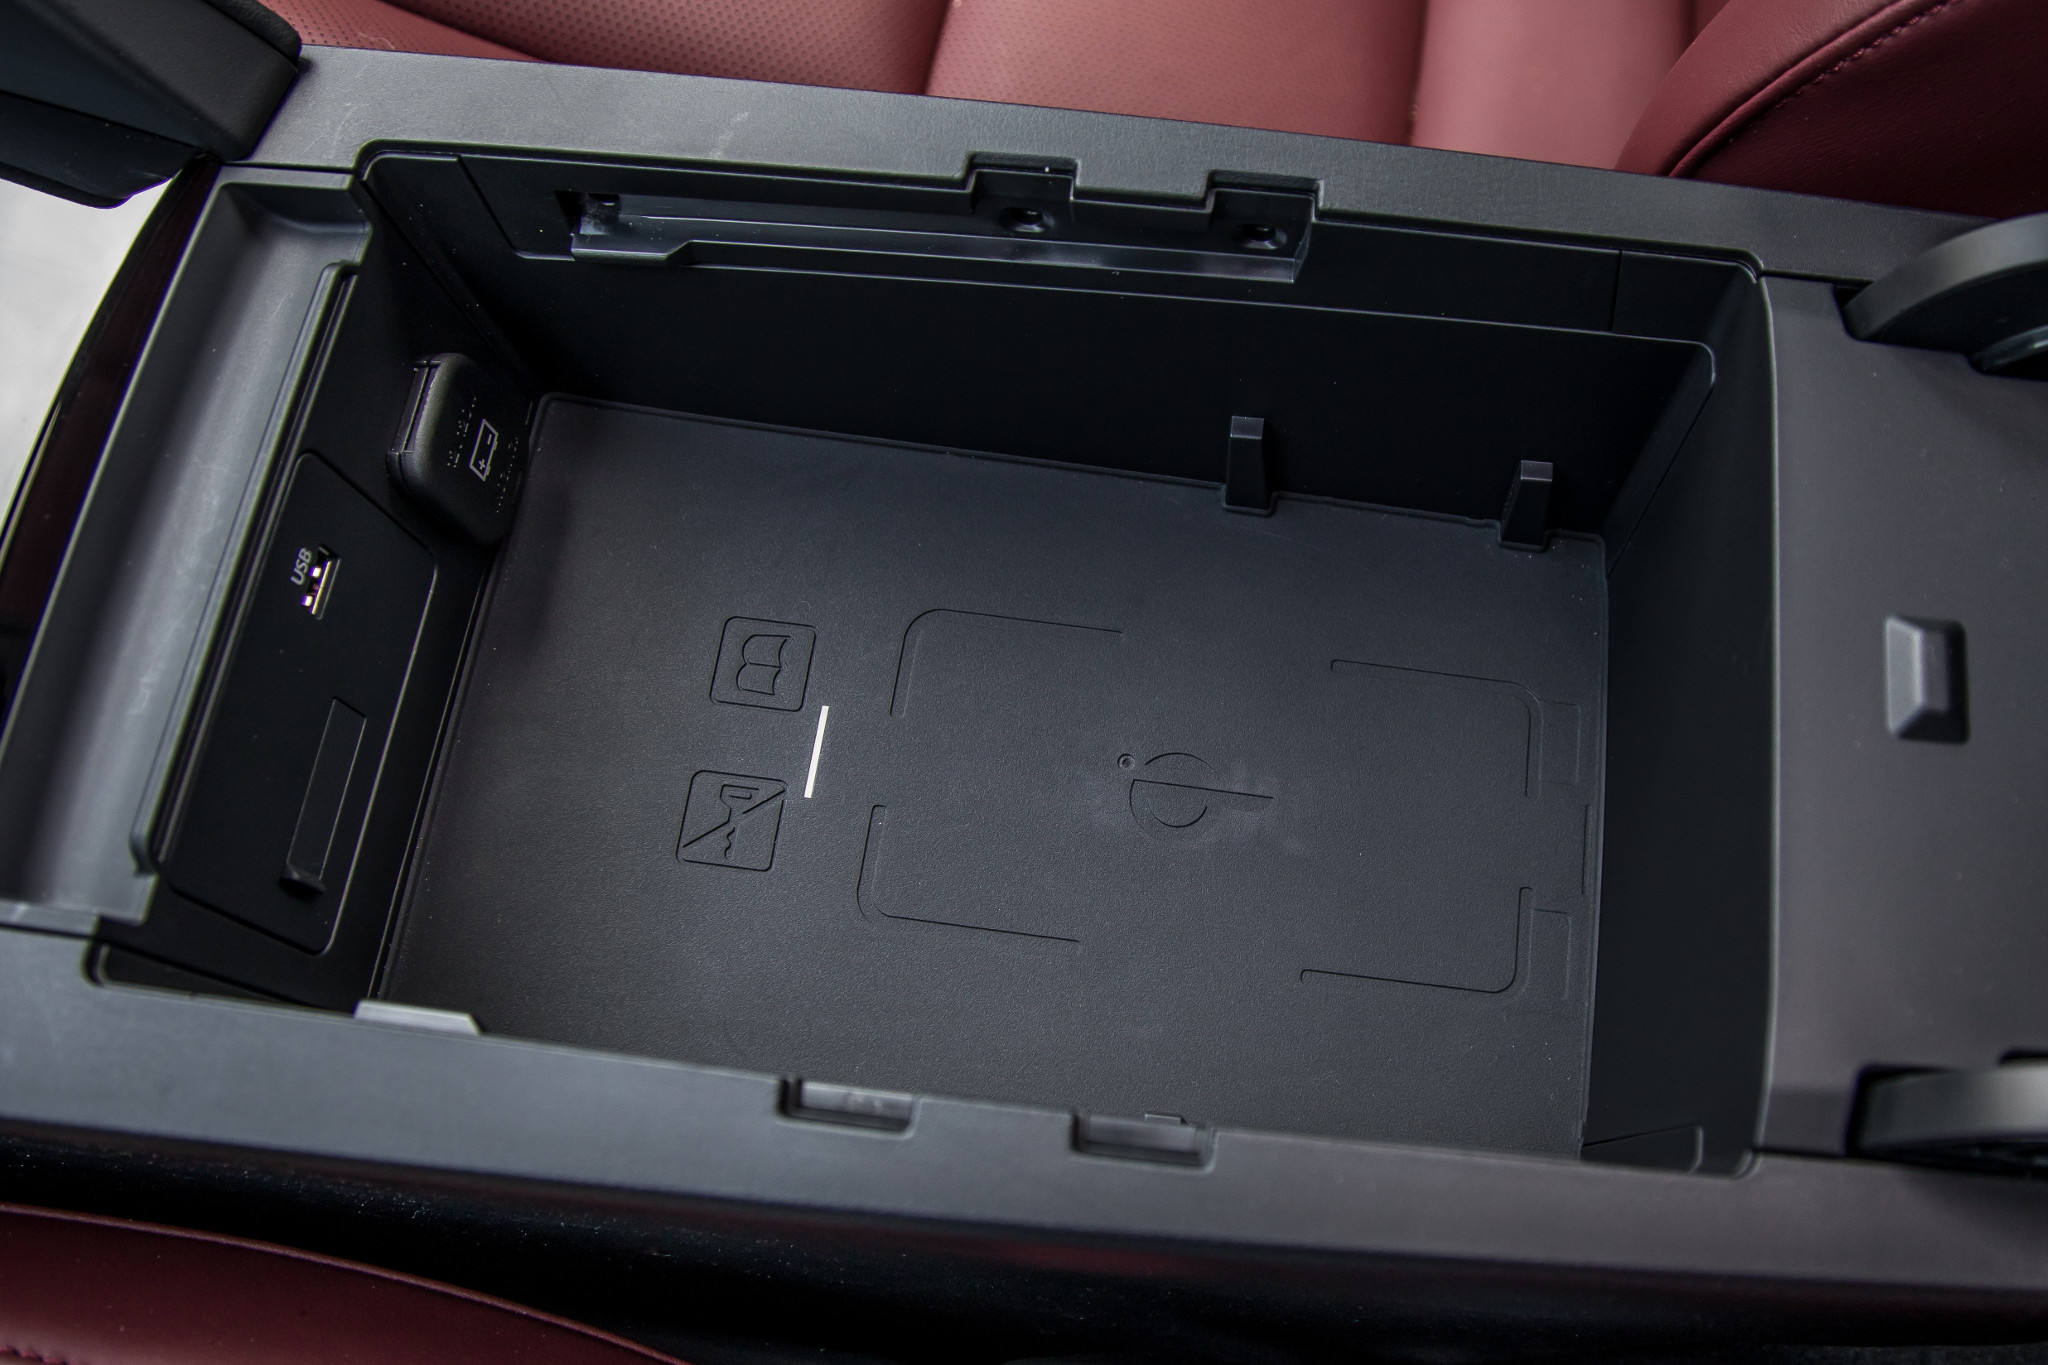 26-mazda-mazda3-2019-center-console--interior--storage--wireless-charging.jpg